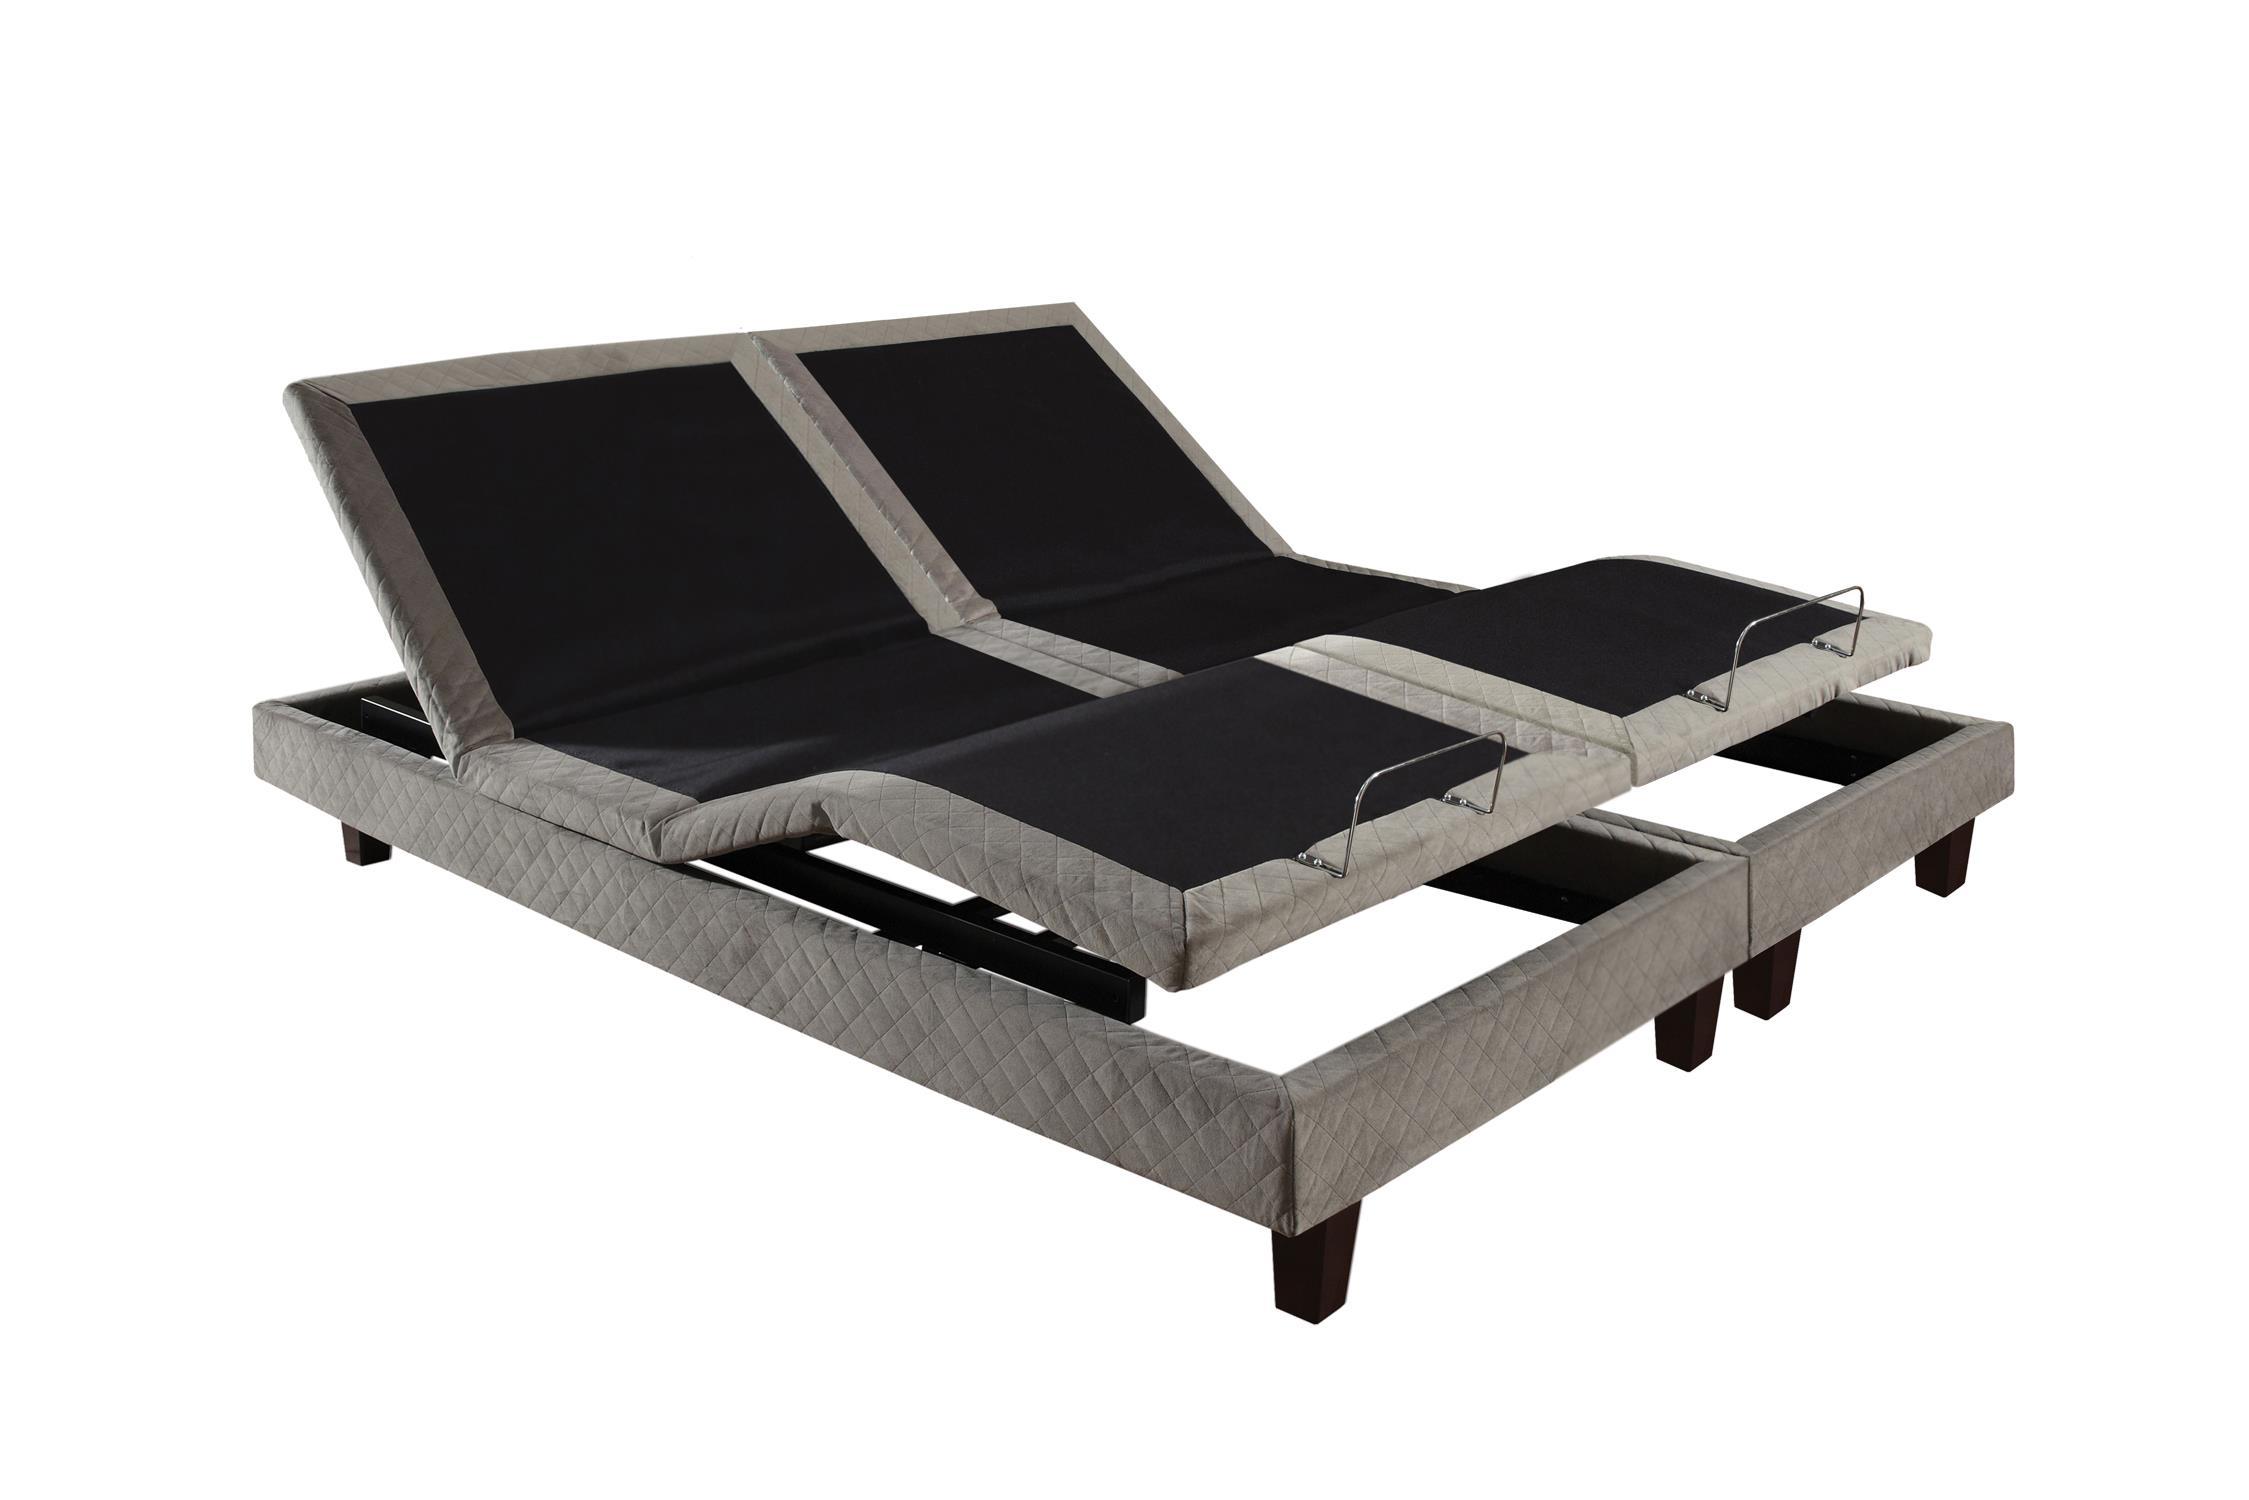 Sealy Posturepedic Plus B1 King Cushion Firm EPT Mattress ...